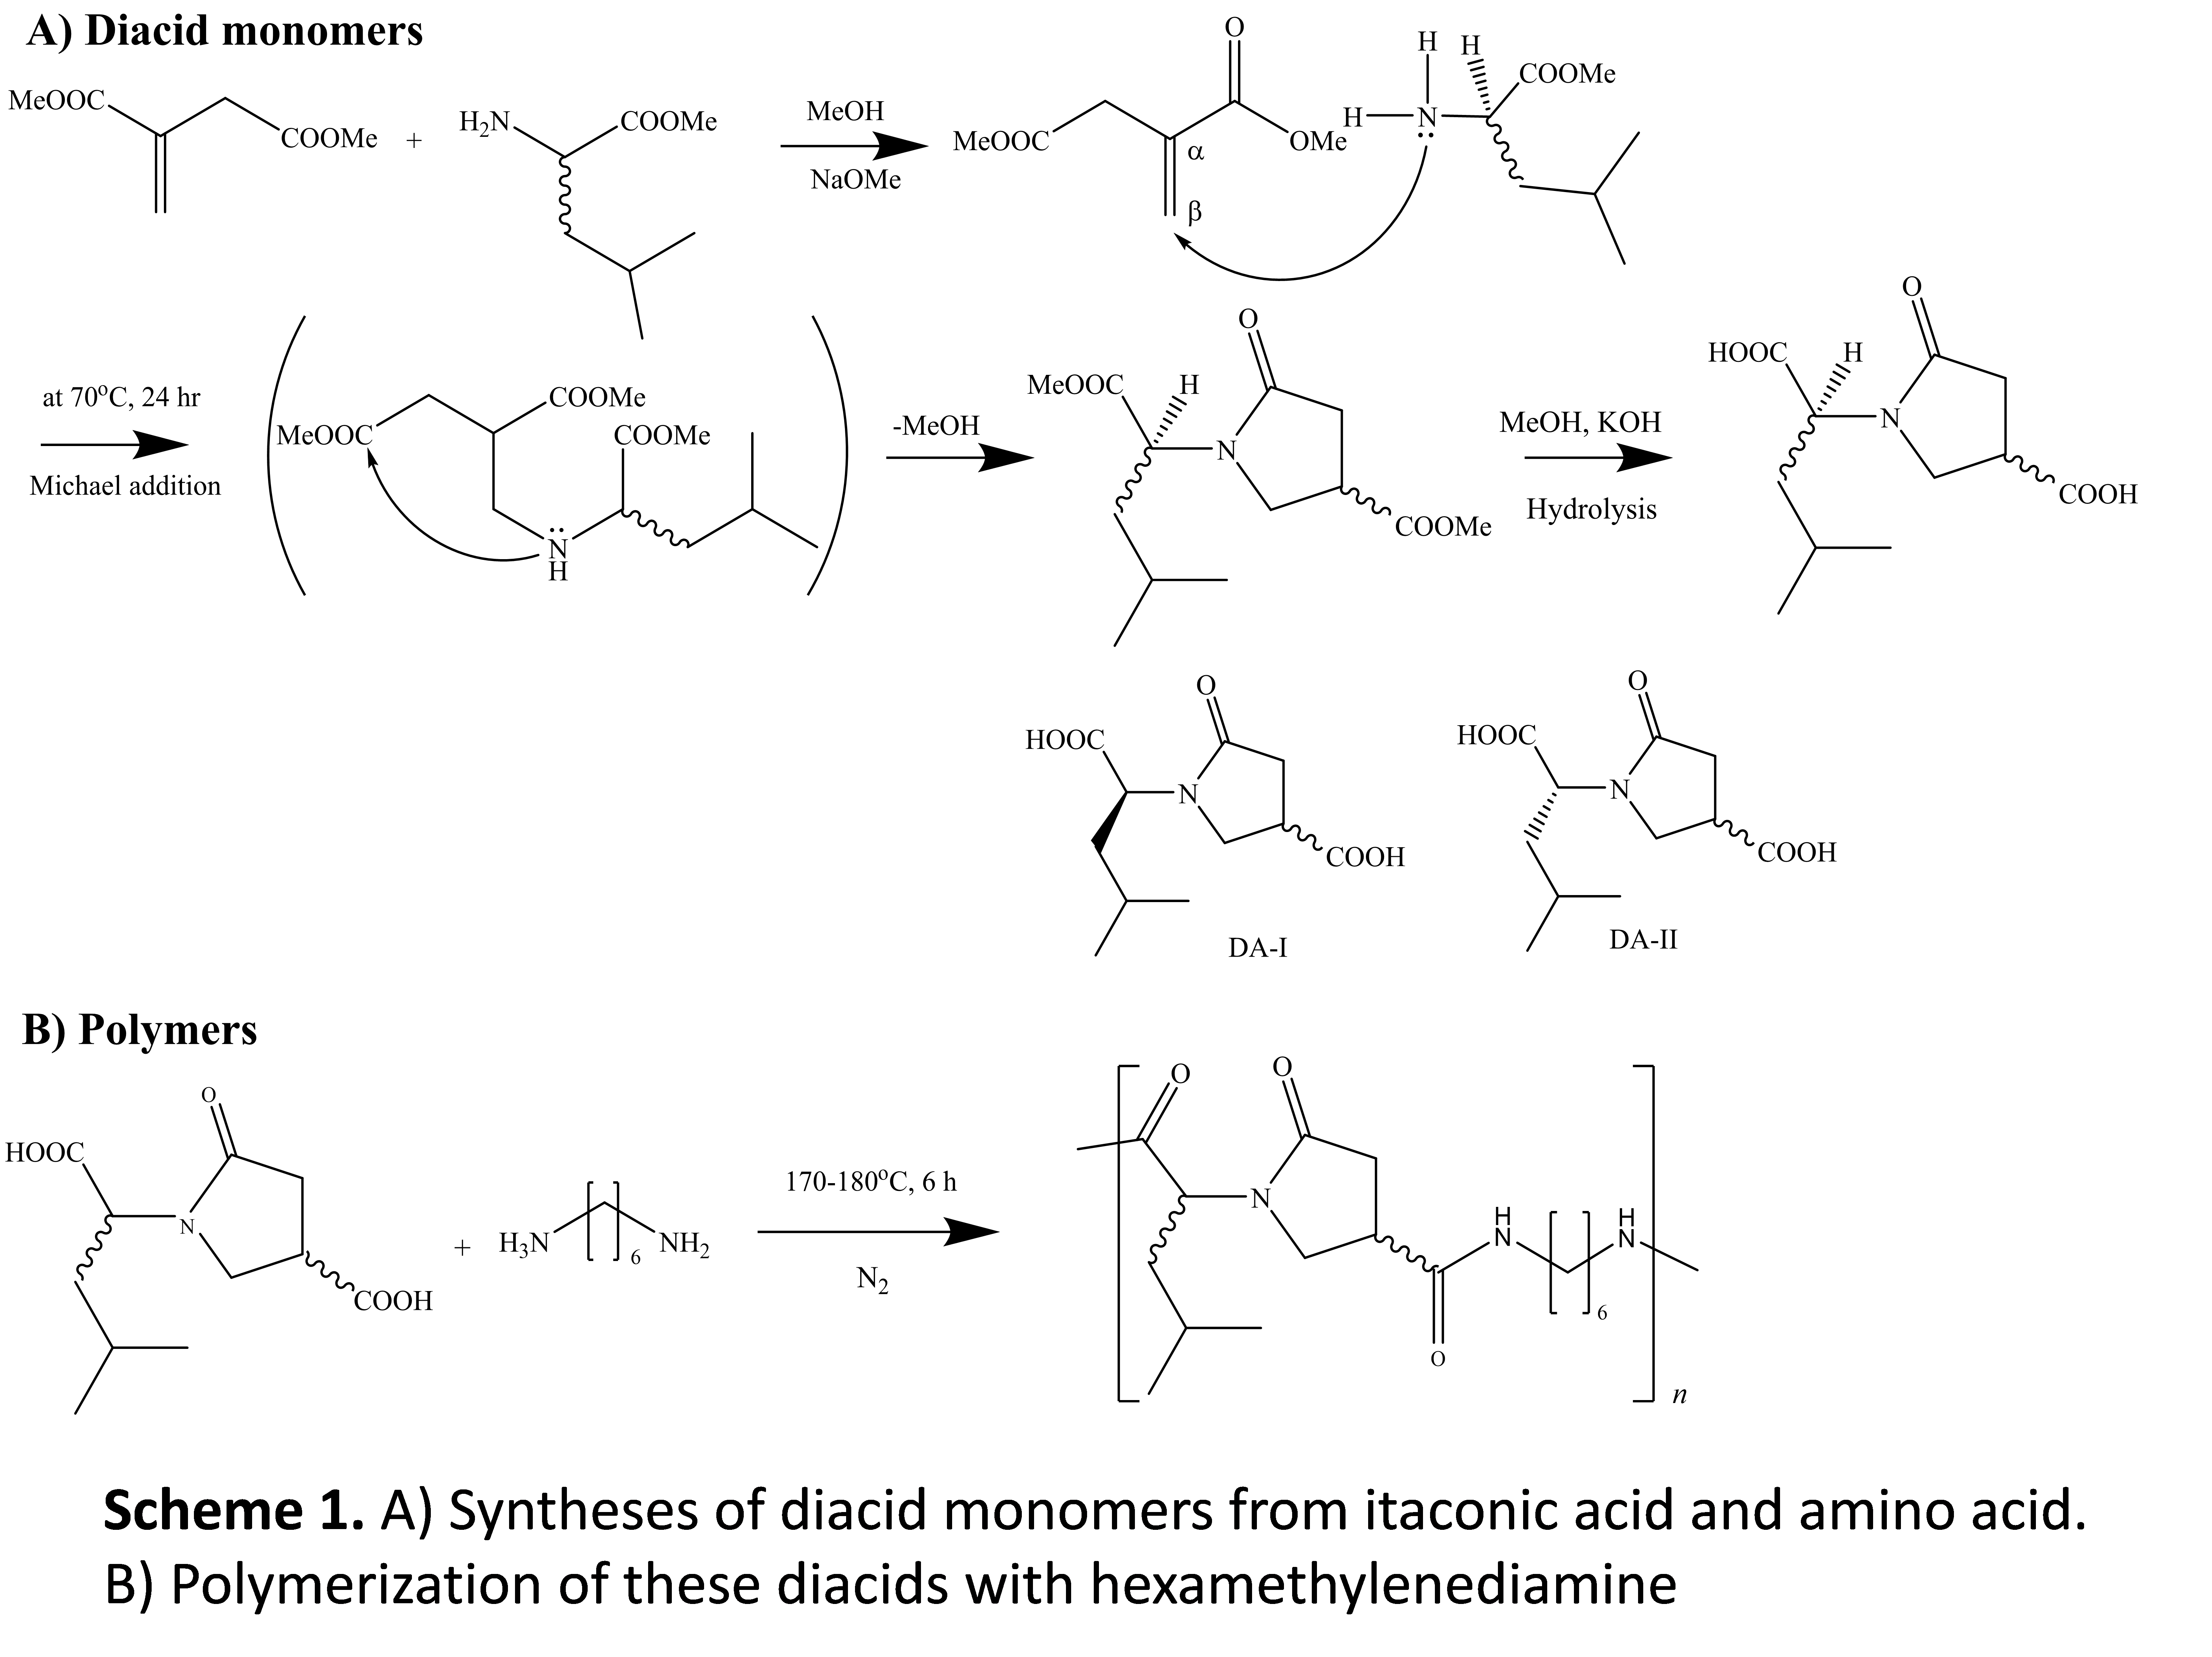 pr20210510-f1.png